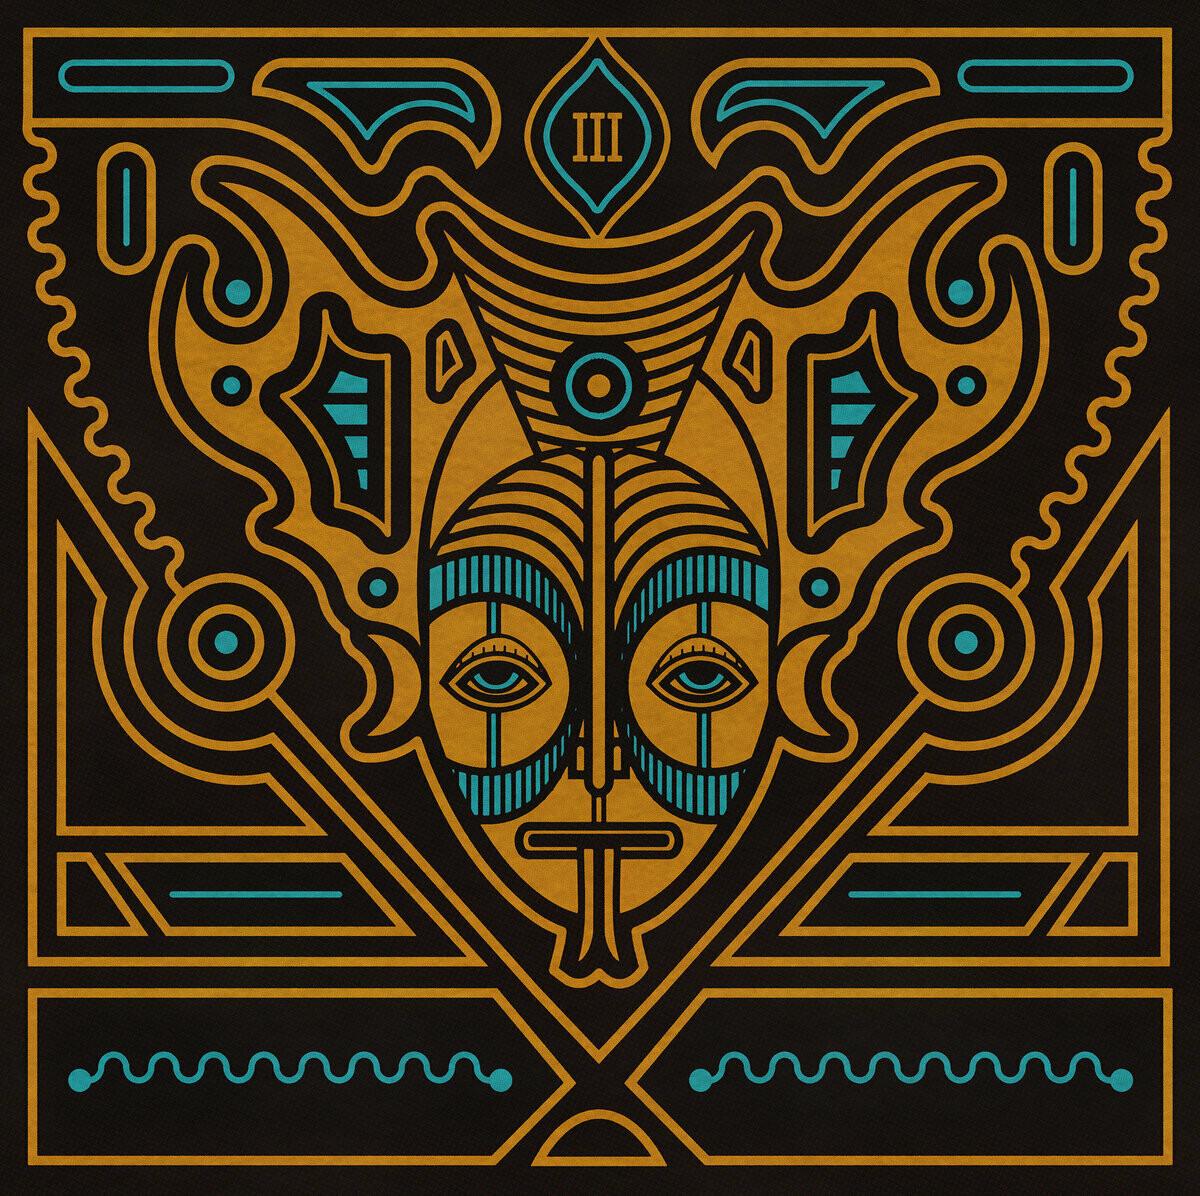 Naxatras - III - 3LP . Triple Gatefold. (RMAF Audiophile Album of the Year 2019)